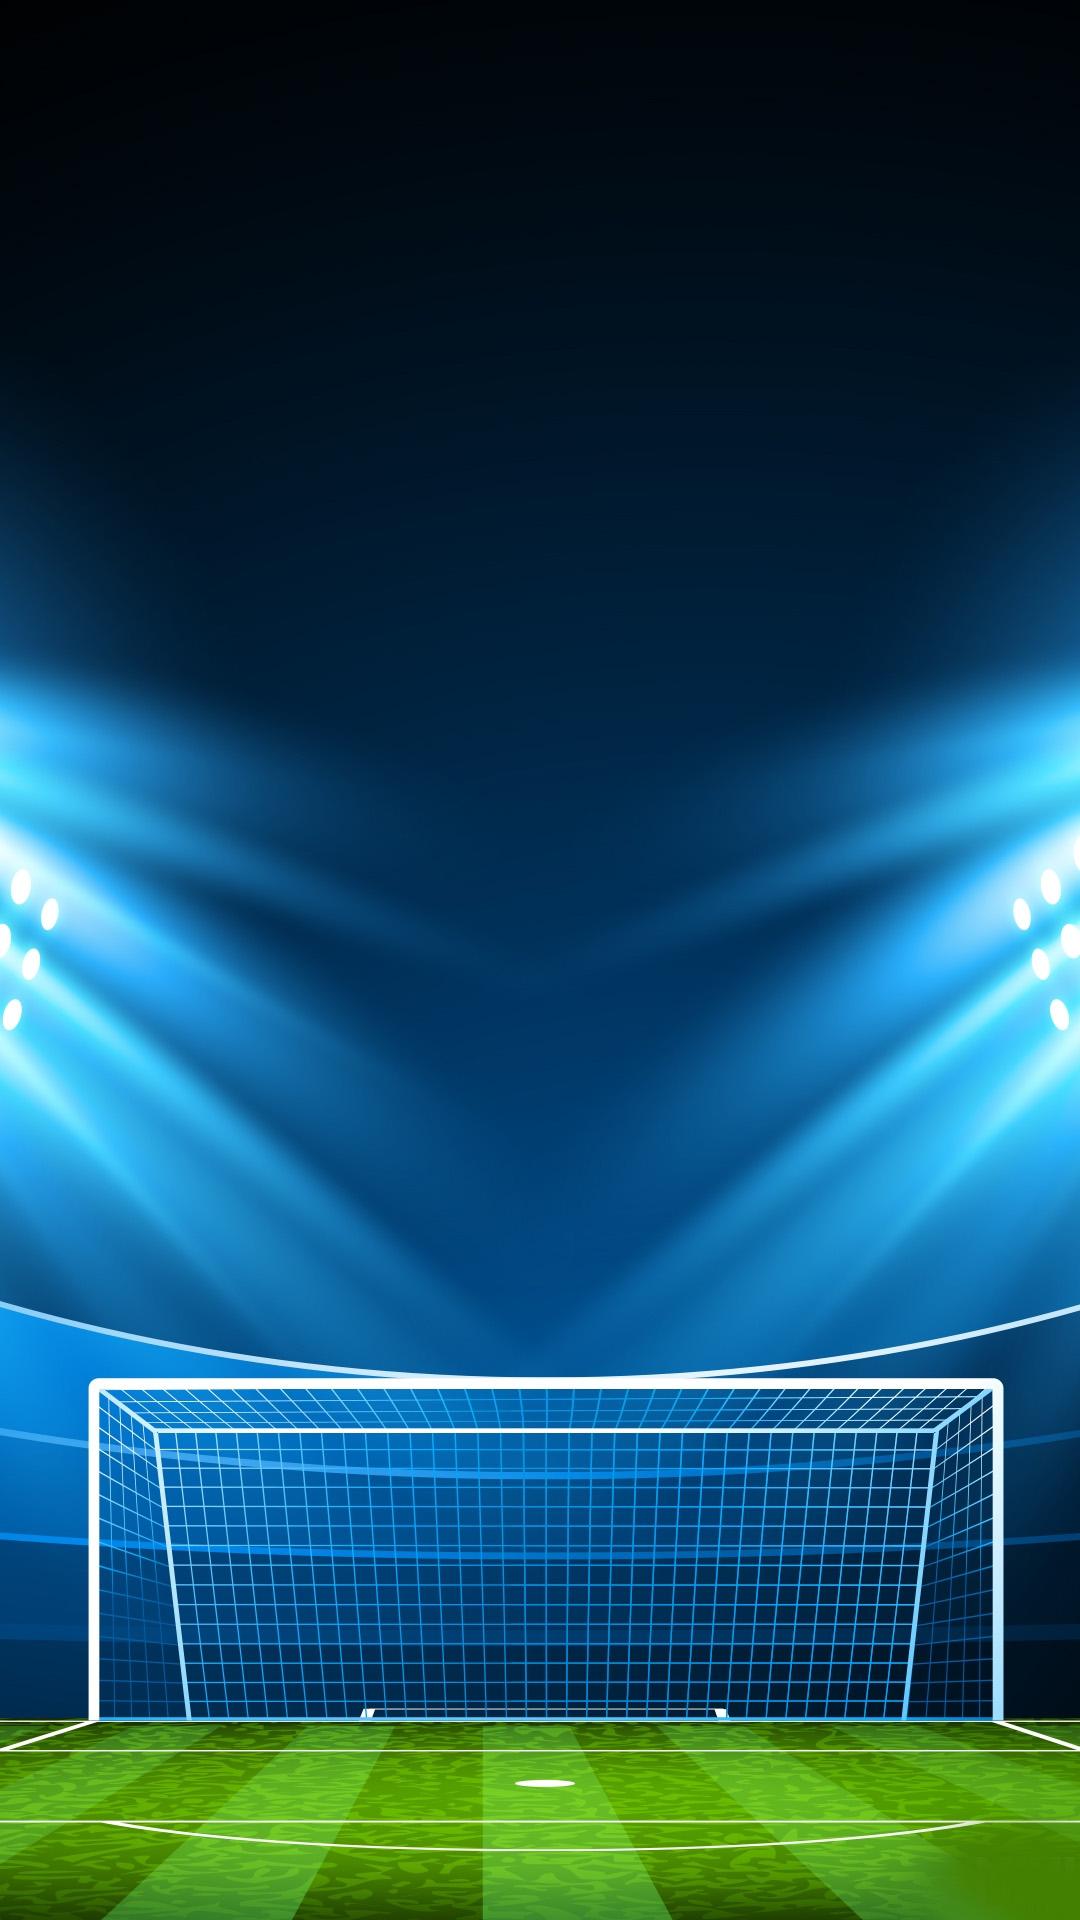 shiny soccer field background  brilliant  football  field